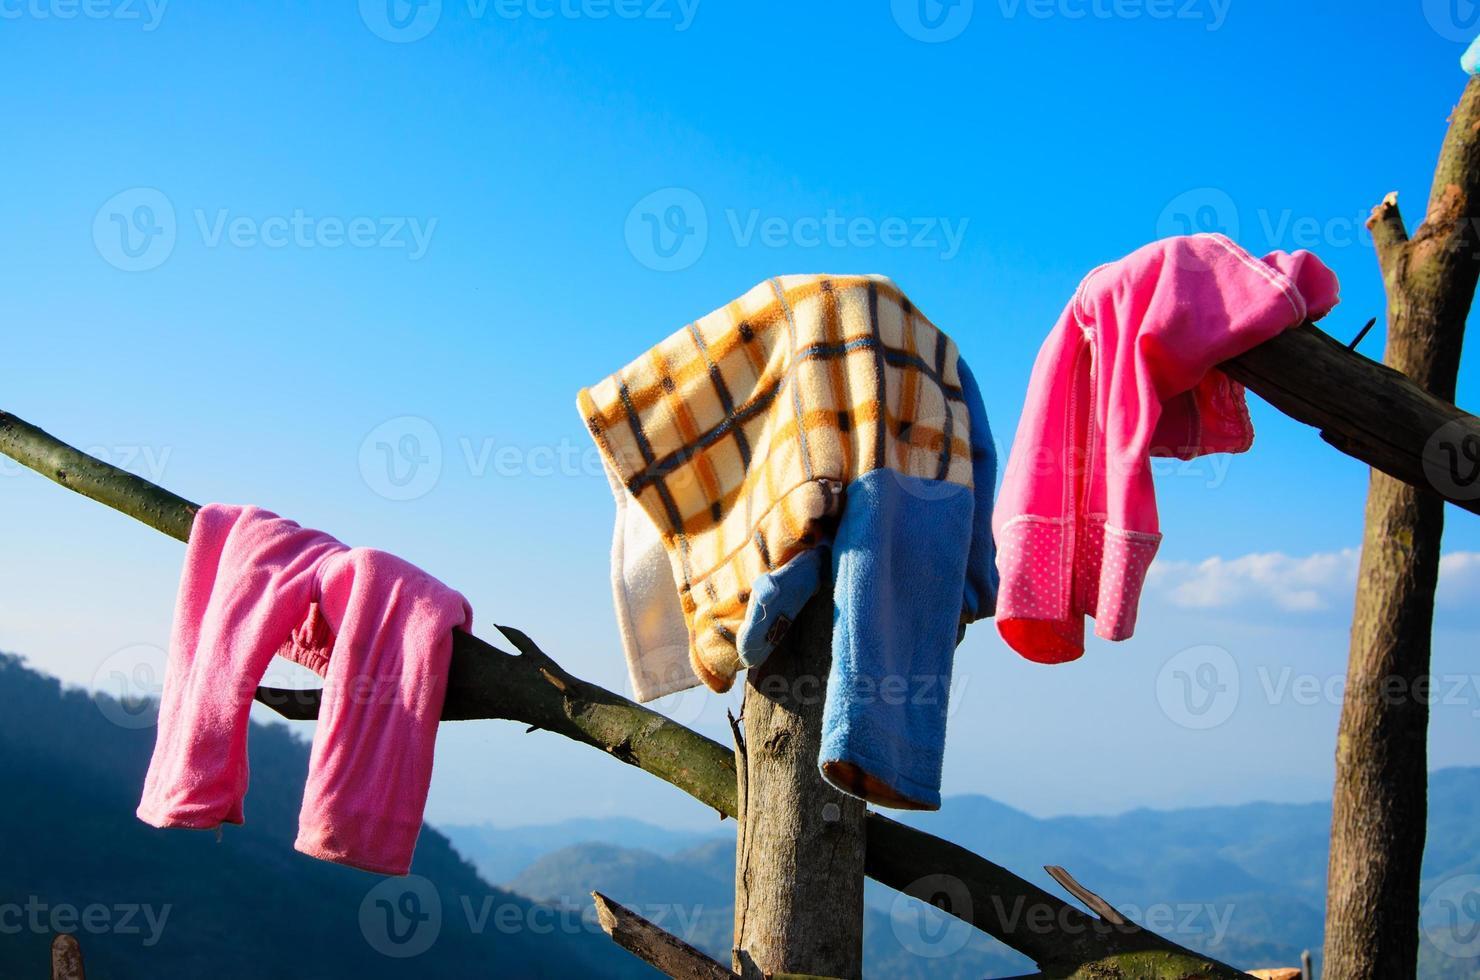 secar roupa fora foto